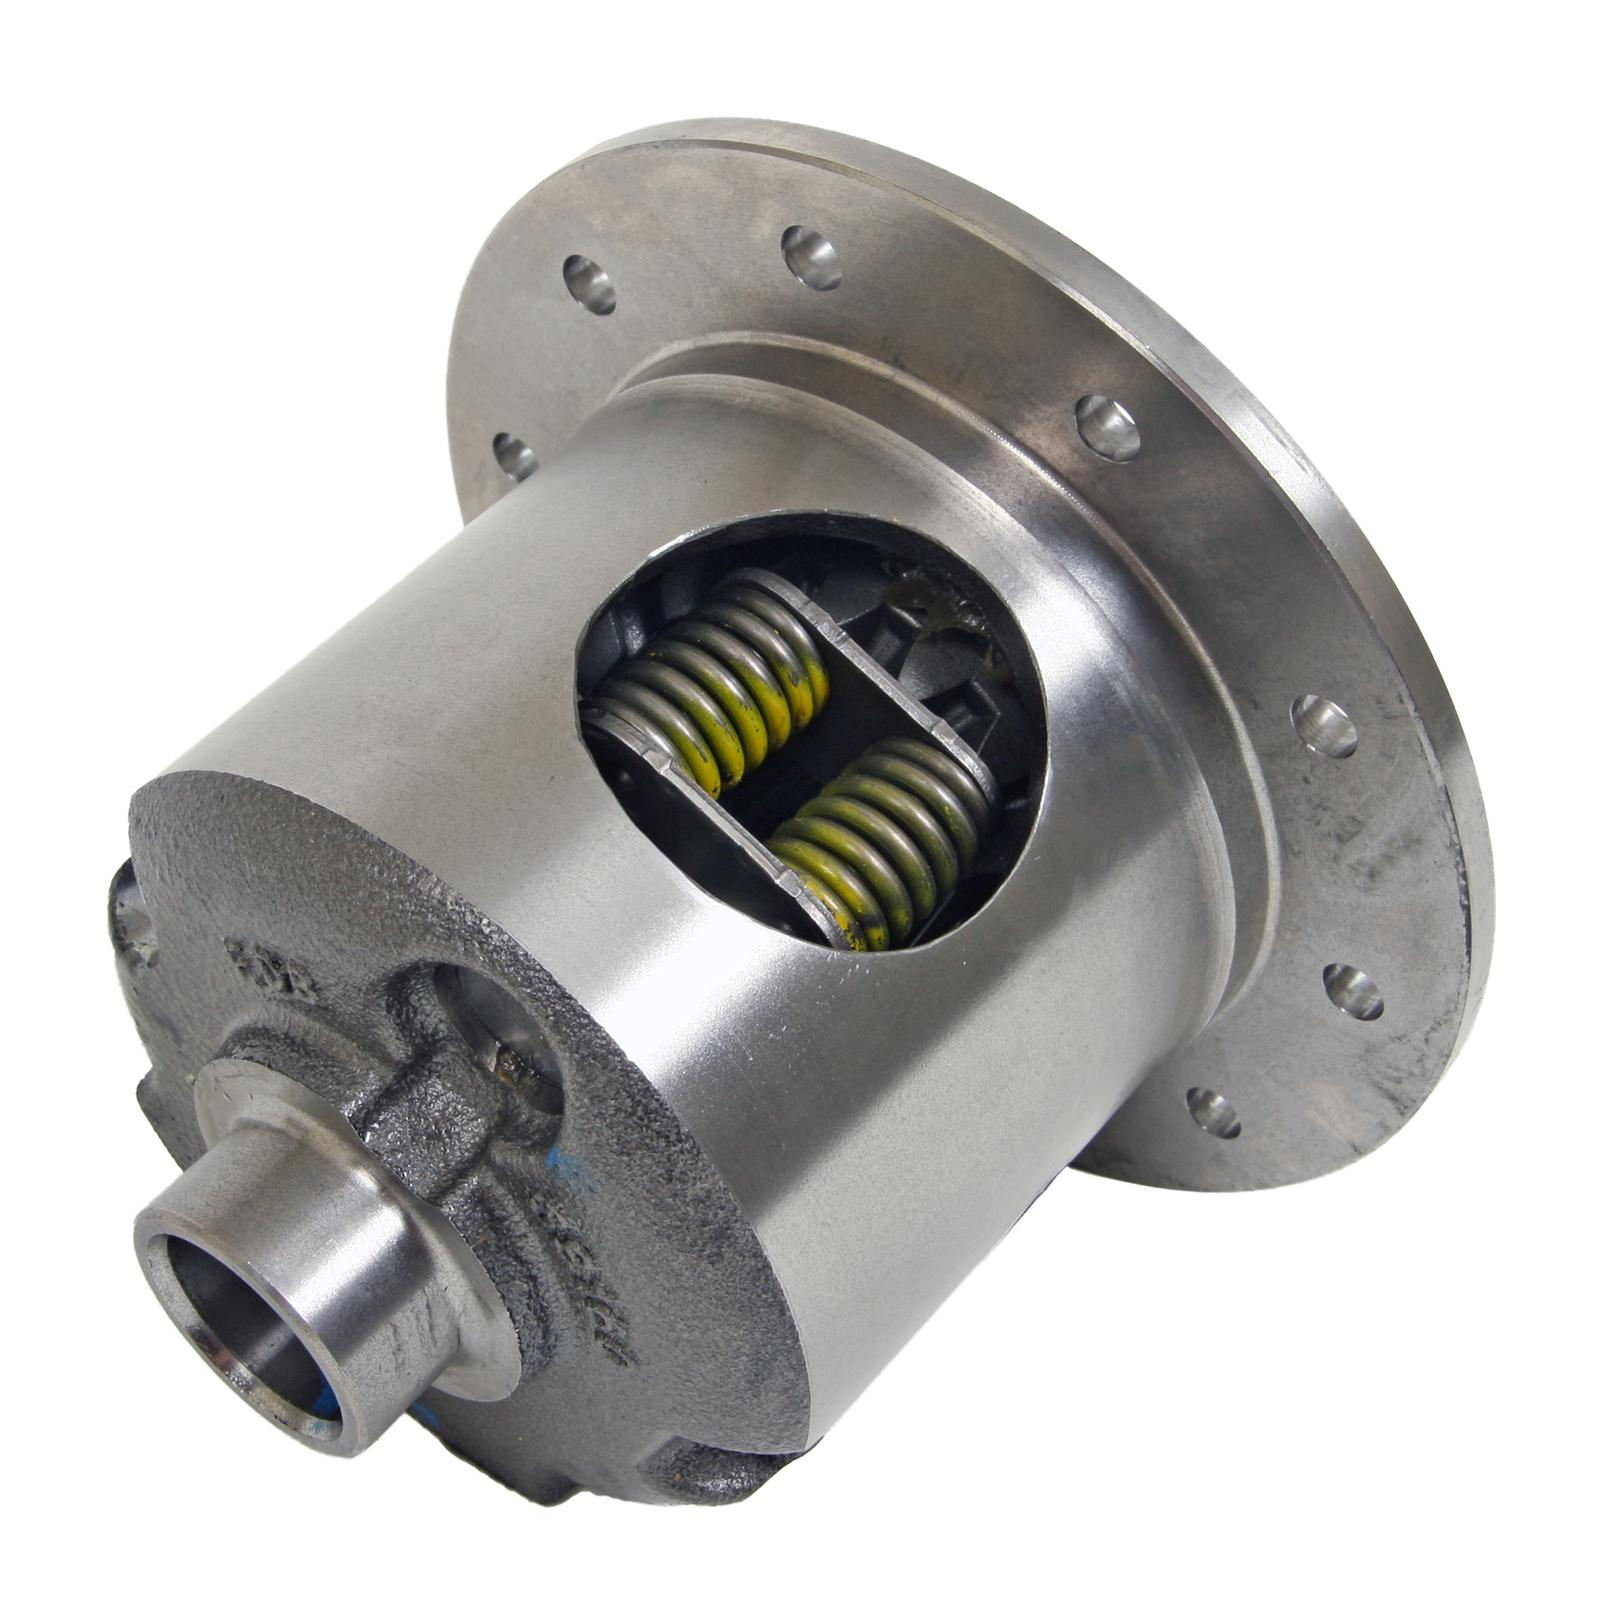 Eaton Axle Parts : Eaton posi performance differential gm quot buick pontiac